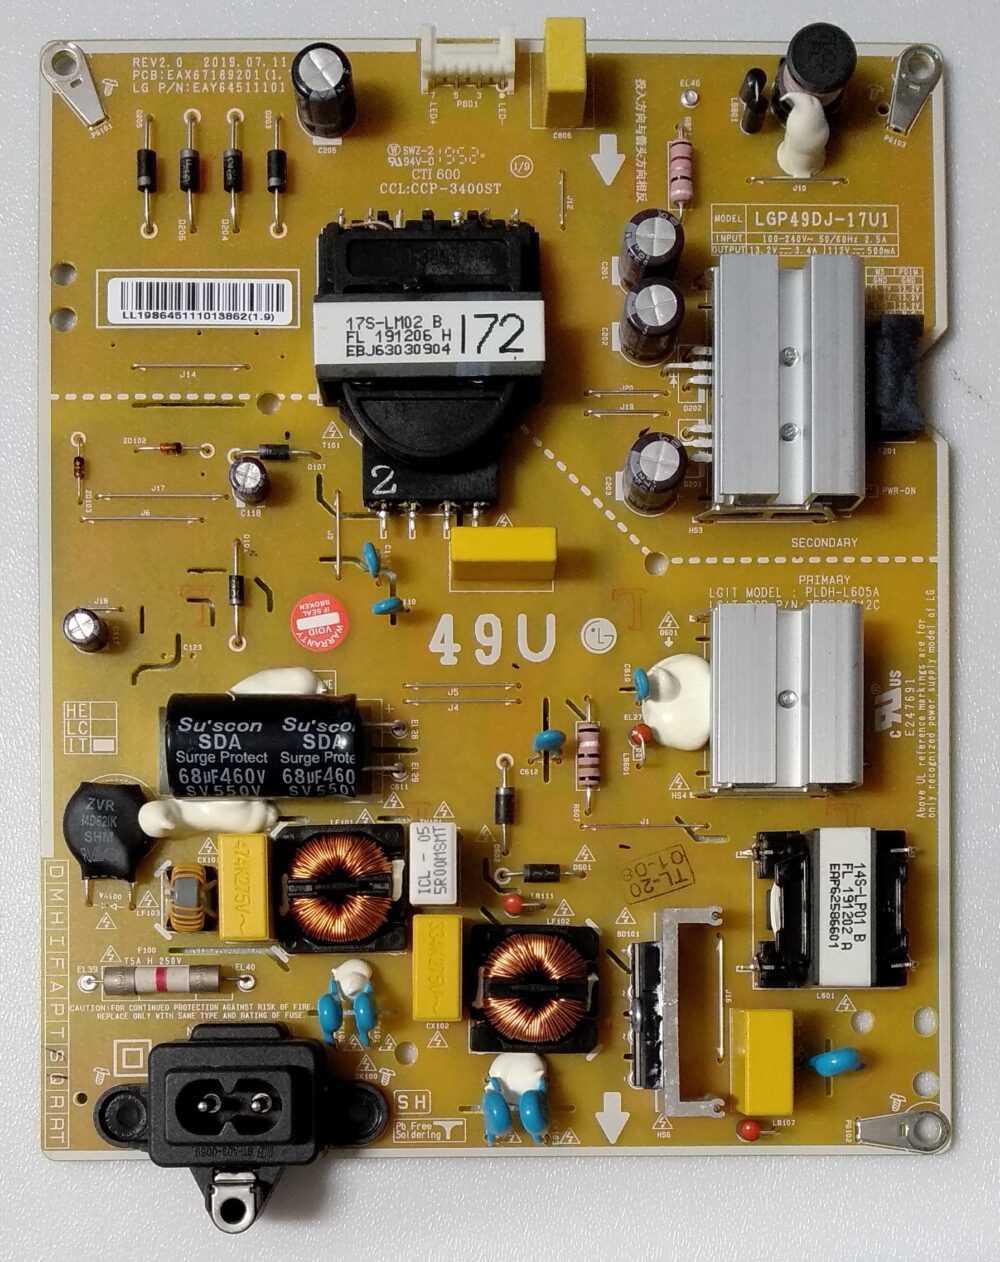 EAX67189201 (1.7) - EAY64511101 - Modulo power LG 49UM7050PFL - Pannello HC490DGG-SLTLA-A19X TV Modules